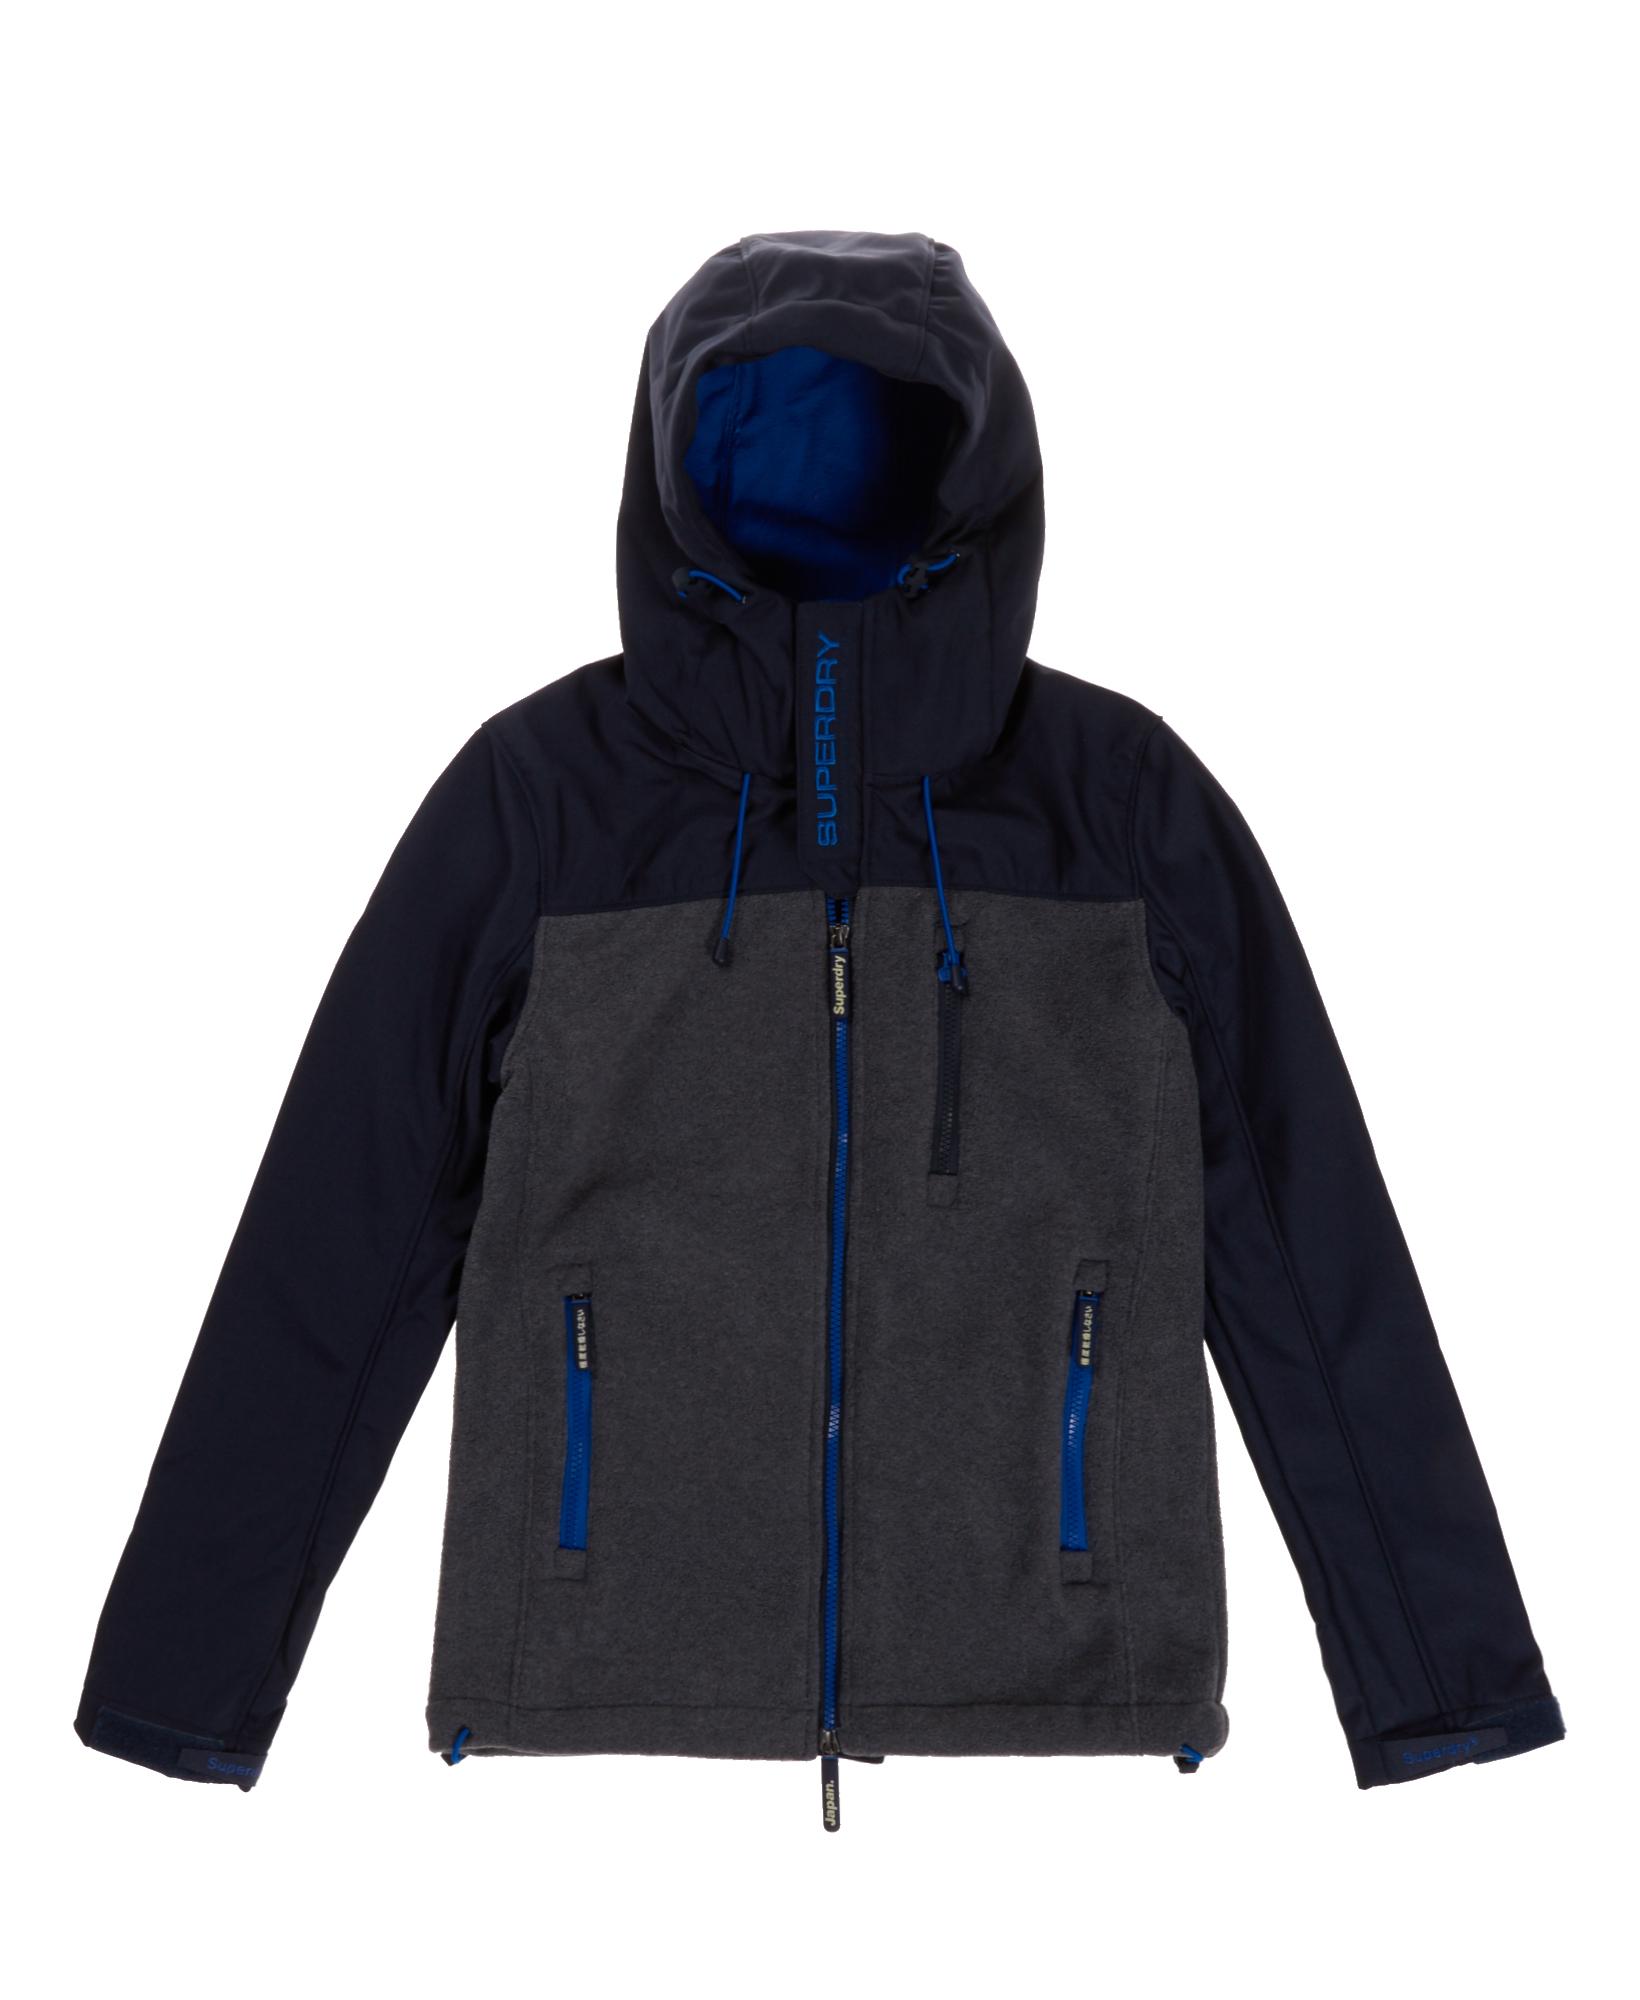 neue herren superdry hoodie polar windtrekker navy marl ebay. Black Bedroom Furniture Sets. Home Design Ideas